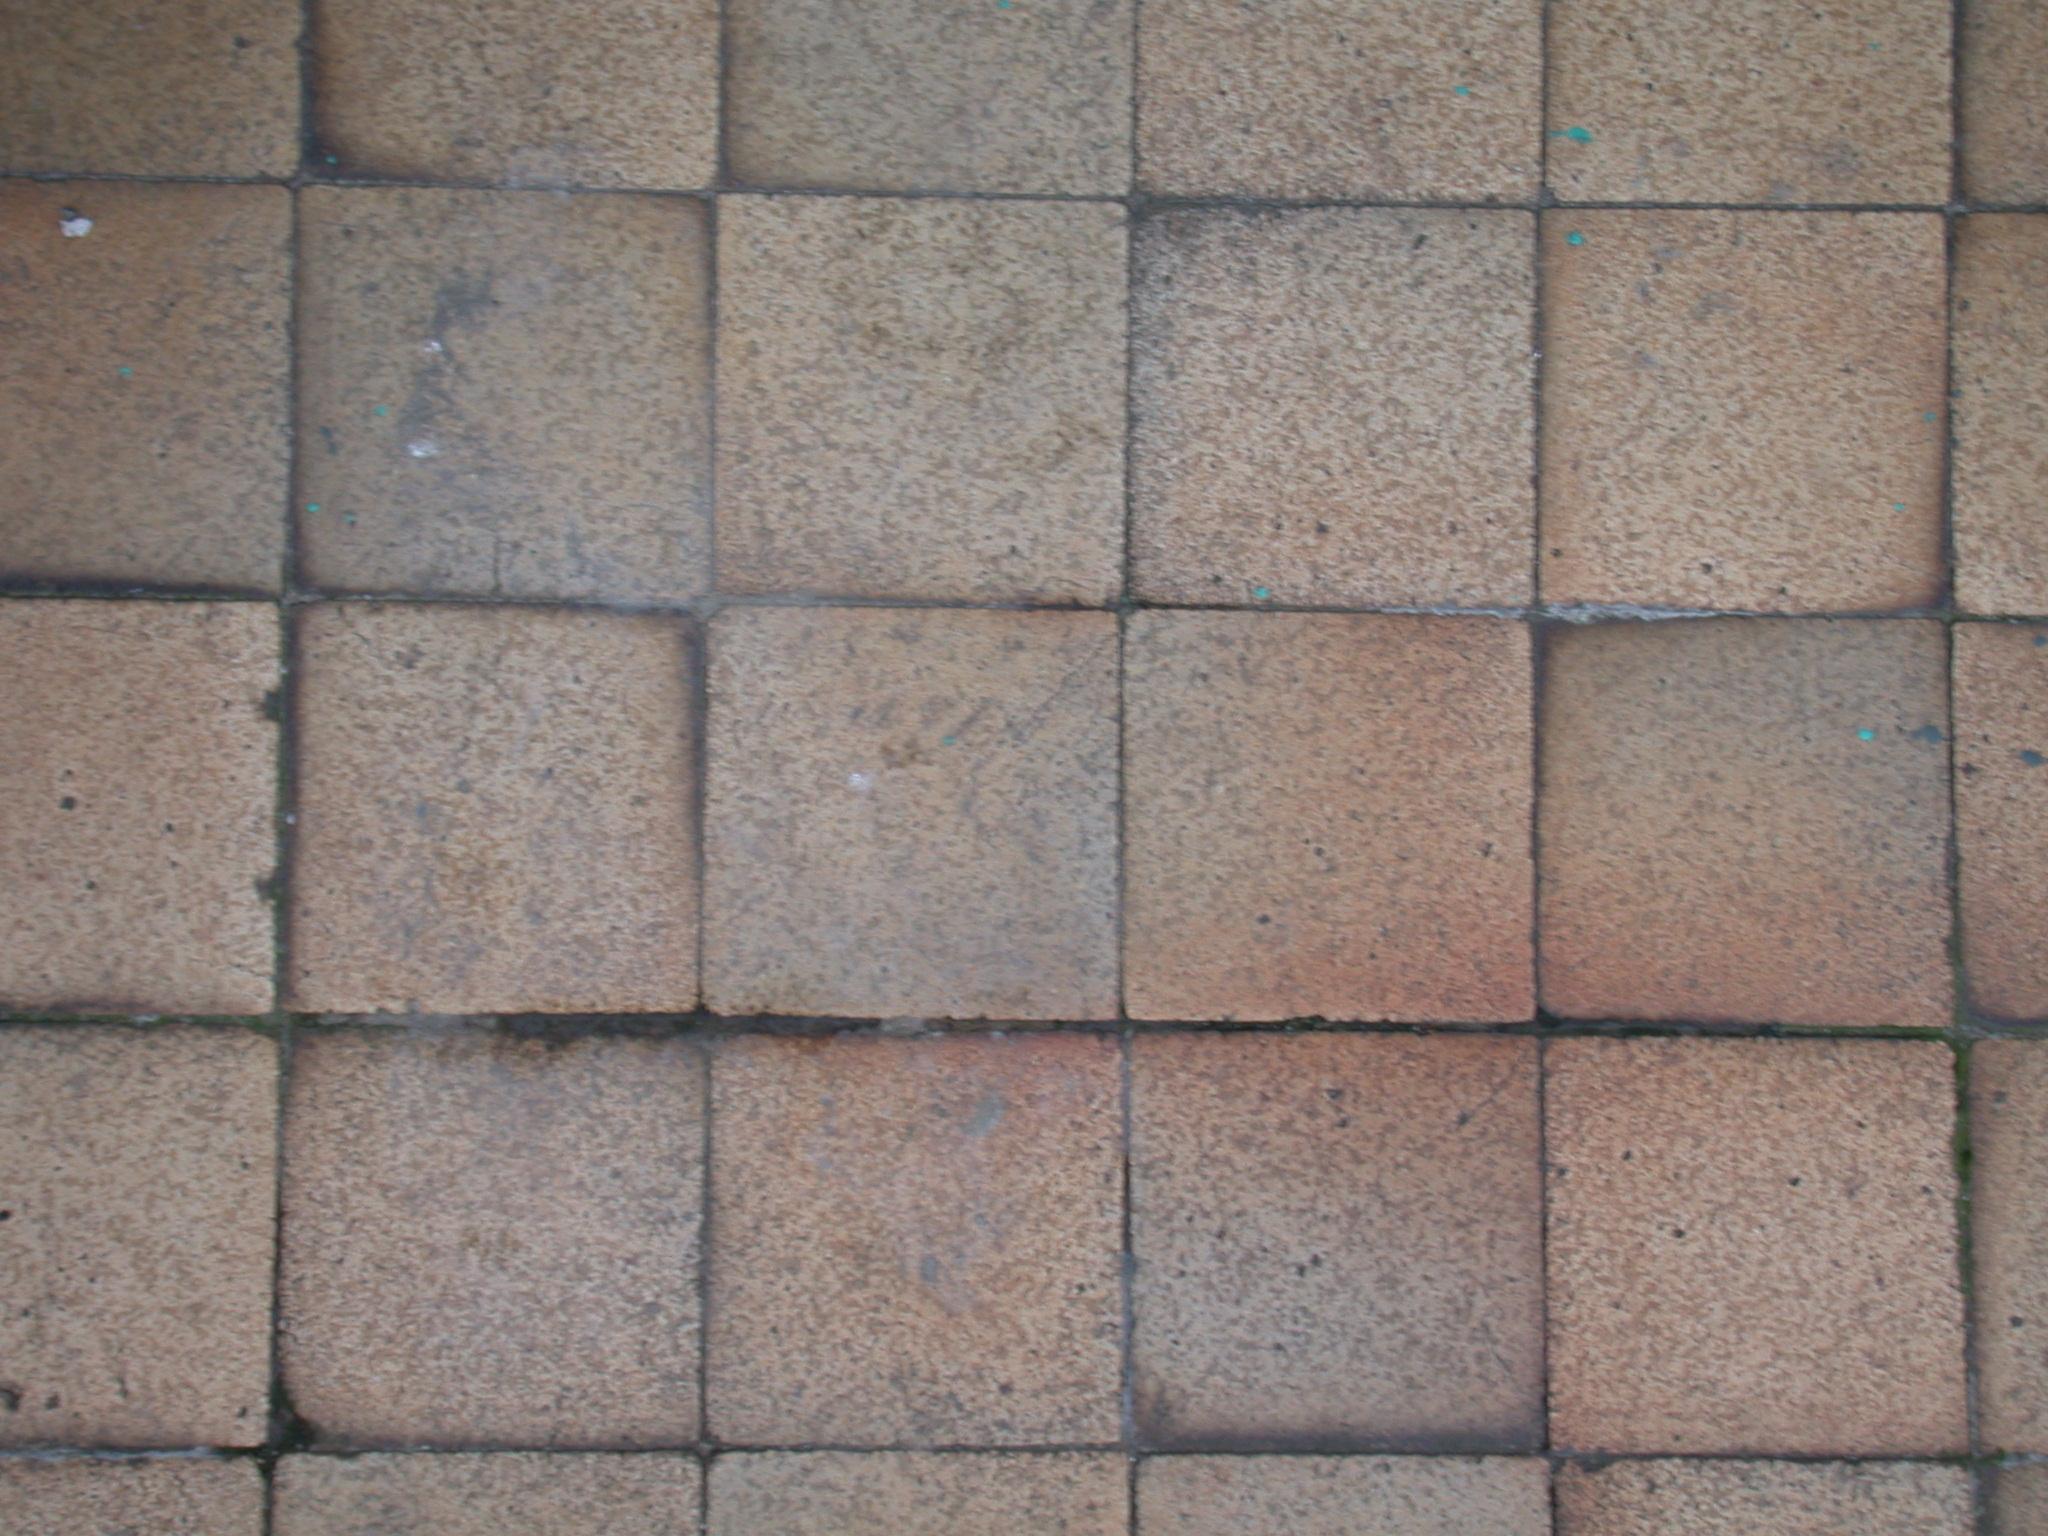 Dirty Floor Tile Textu...